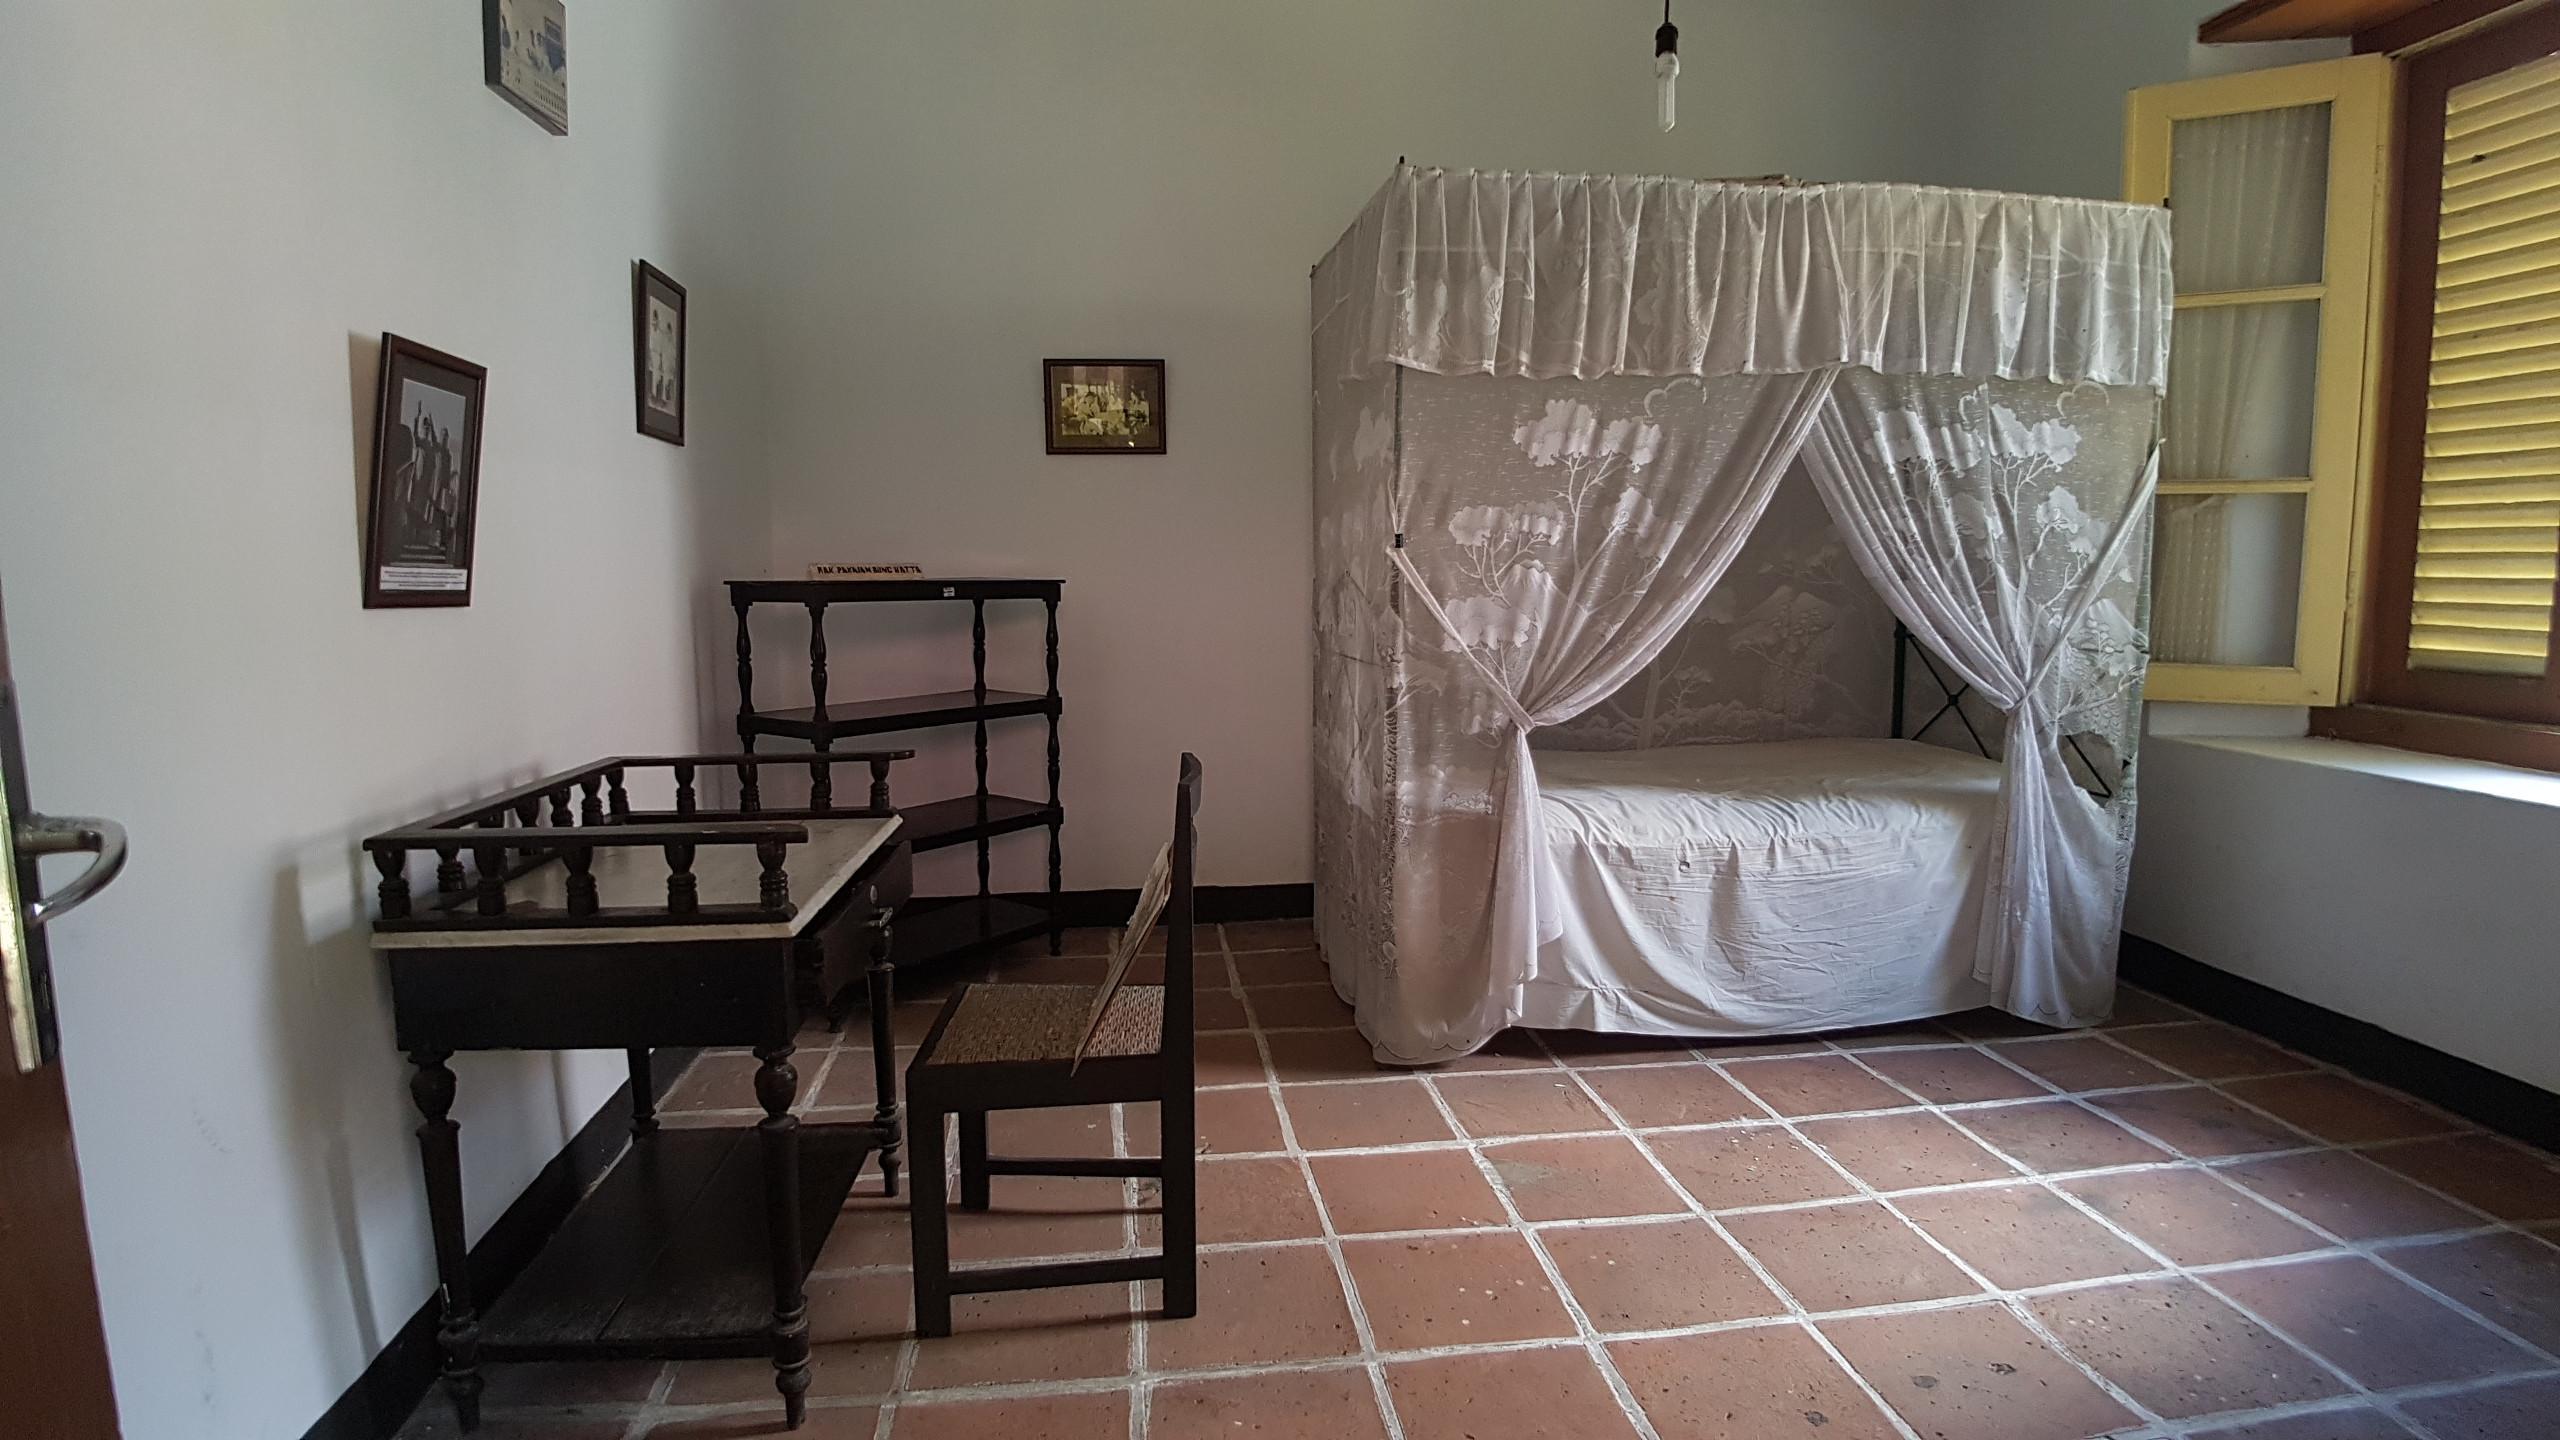 Ranjang yang digunakan Mohammad Hatta selama berada di rumah pengasingan di Jalan Hatta, Desa Dwi Warna, Kecamatan Banda, Banda Neira, Maluku. (Liputan6.com/Aditya Eka Prawira)